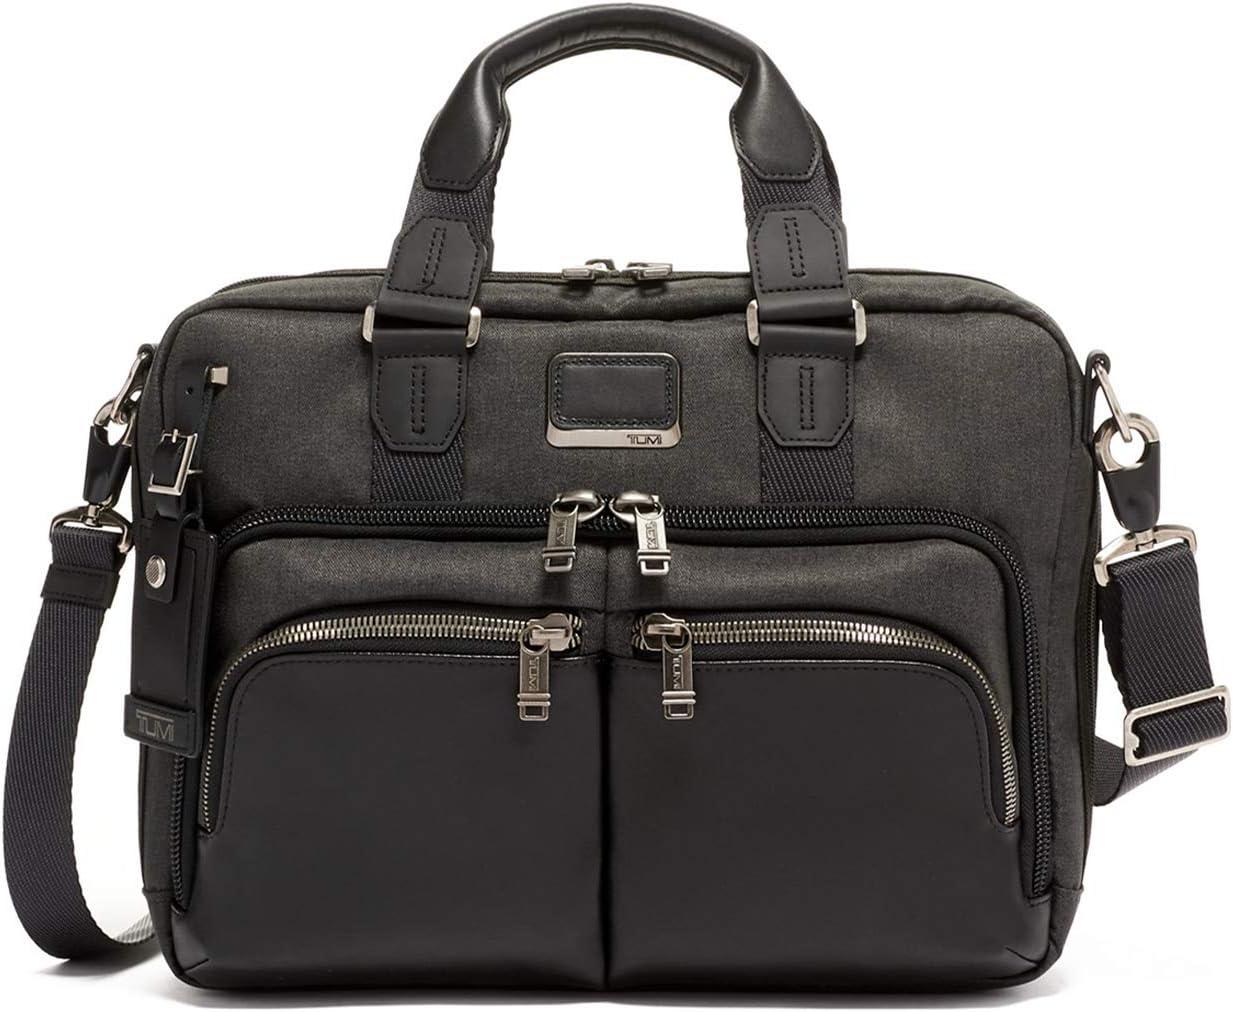 TUMI - Alpha Bravo Albany Laptop Slim Commuter Brief Briefcase - 14 Inch Computer Bag for Men and Women - Graphite